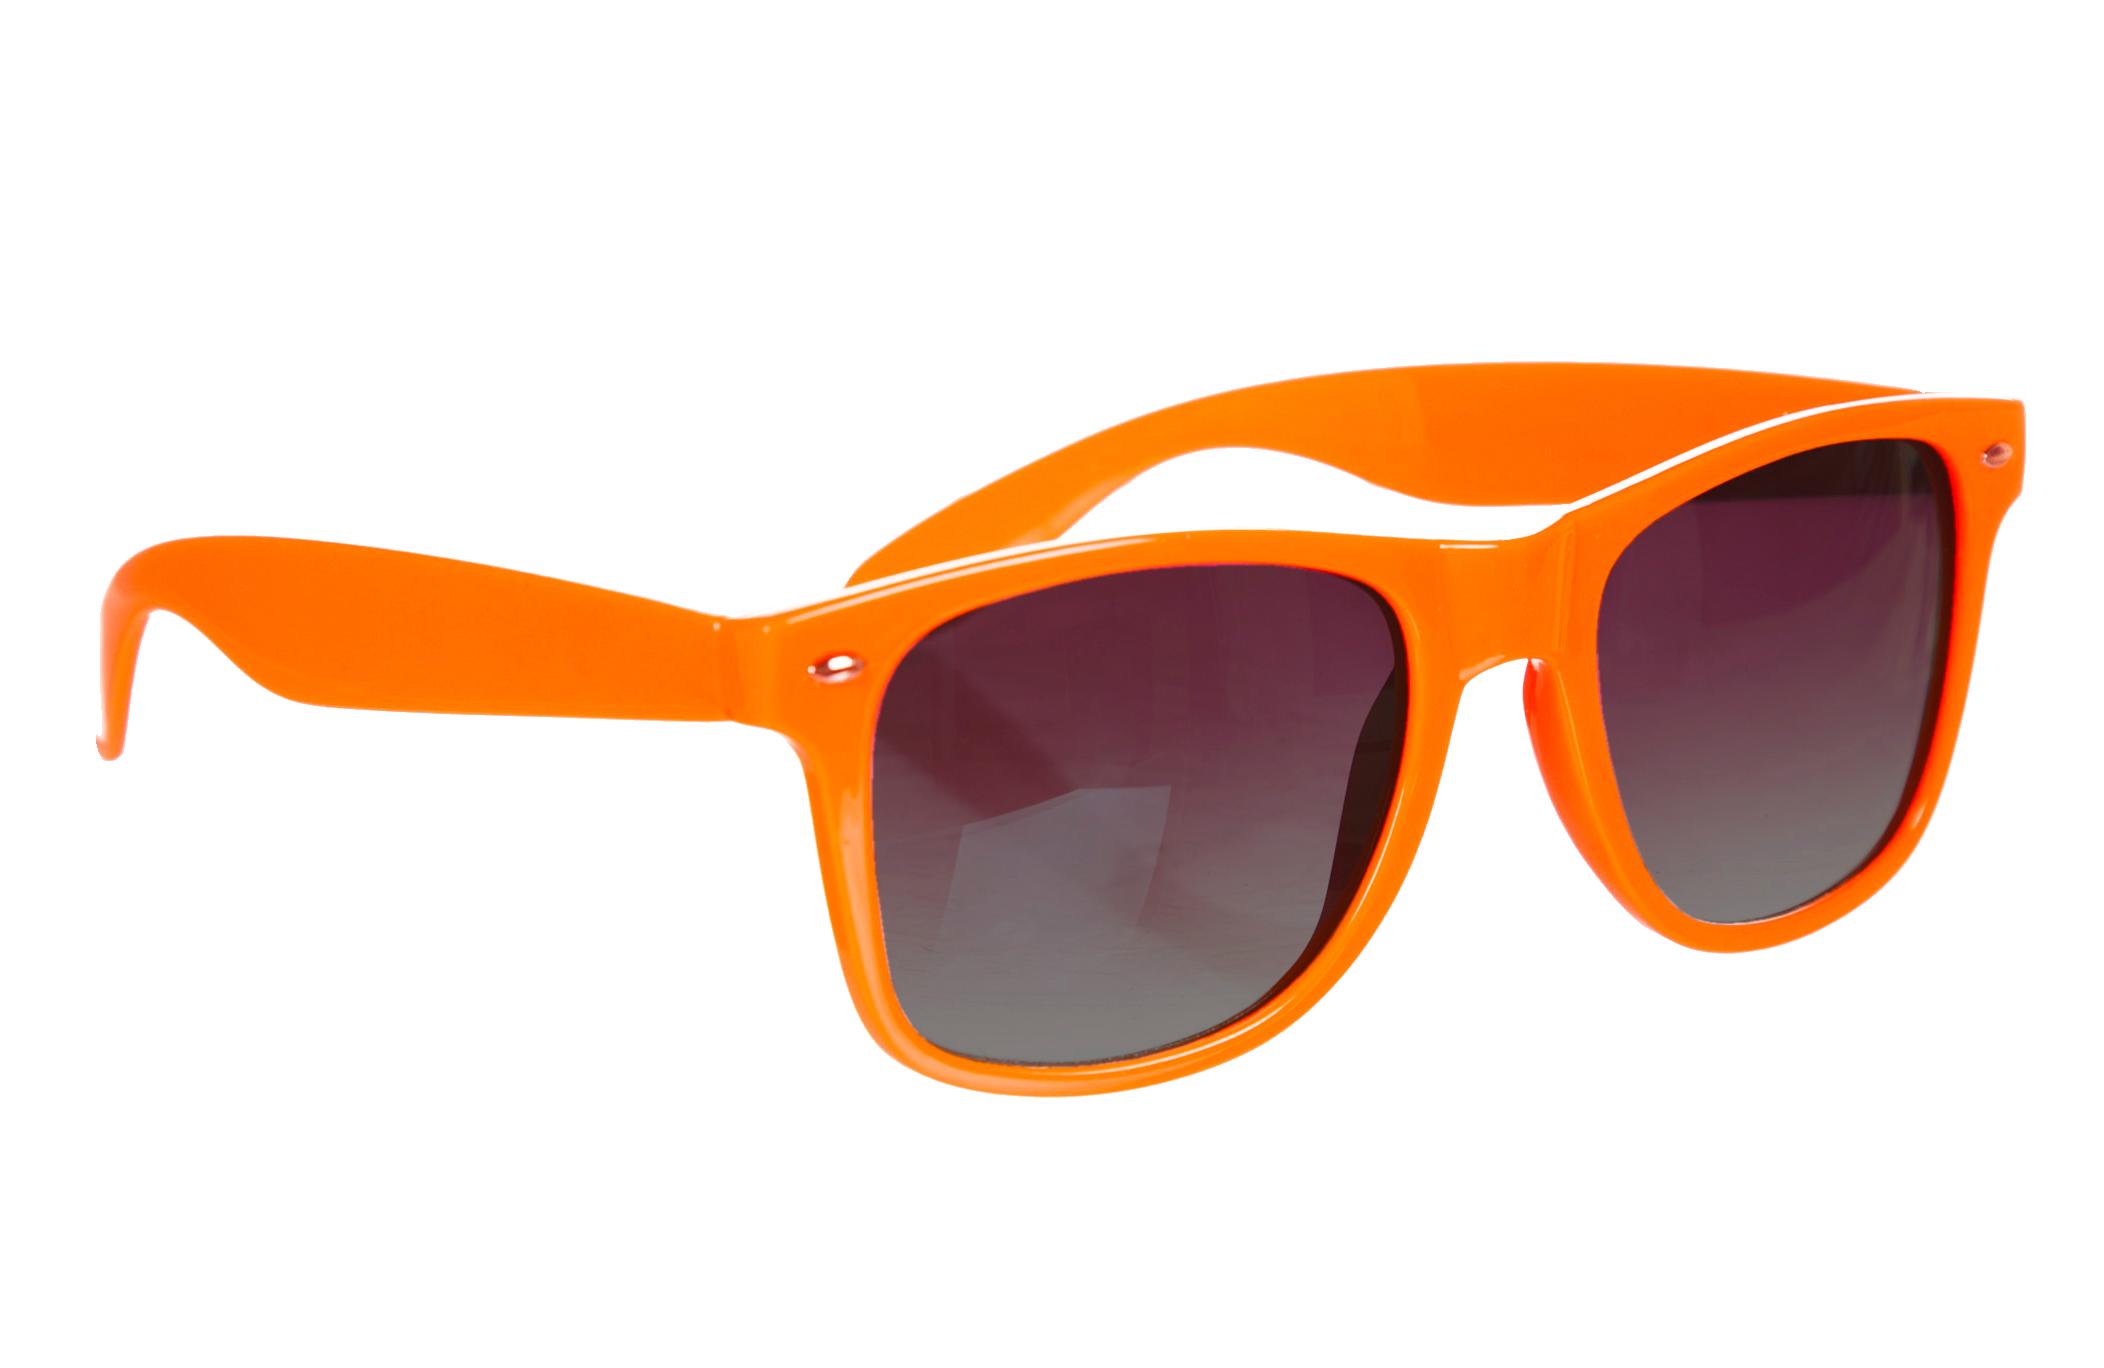 Sunglass PNG Image